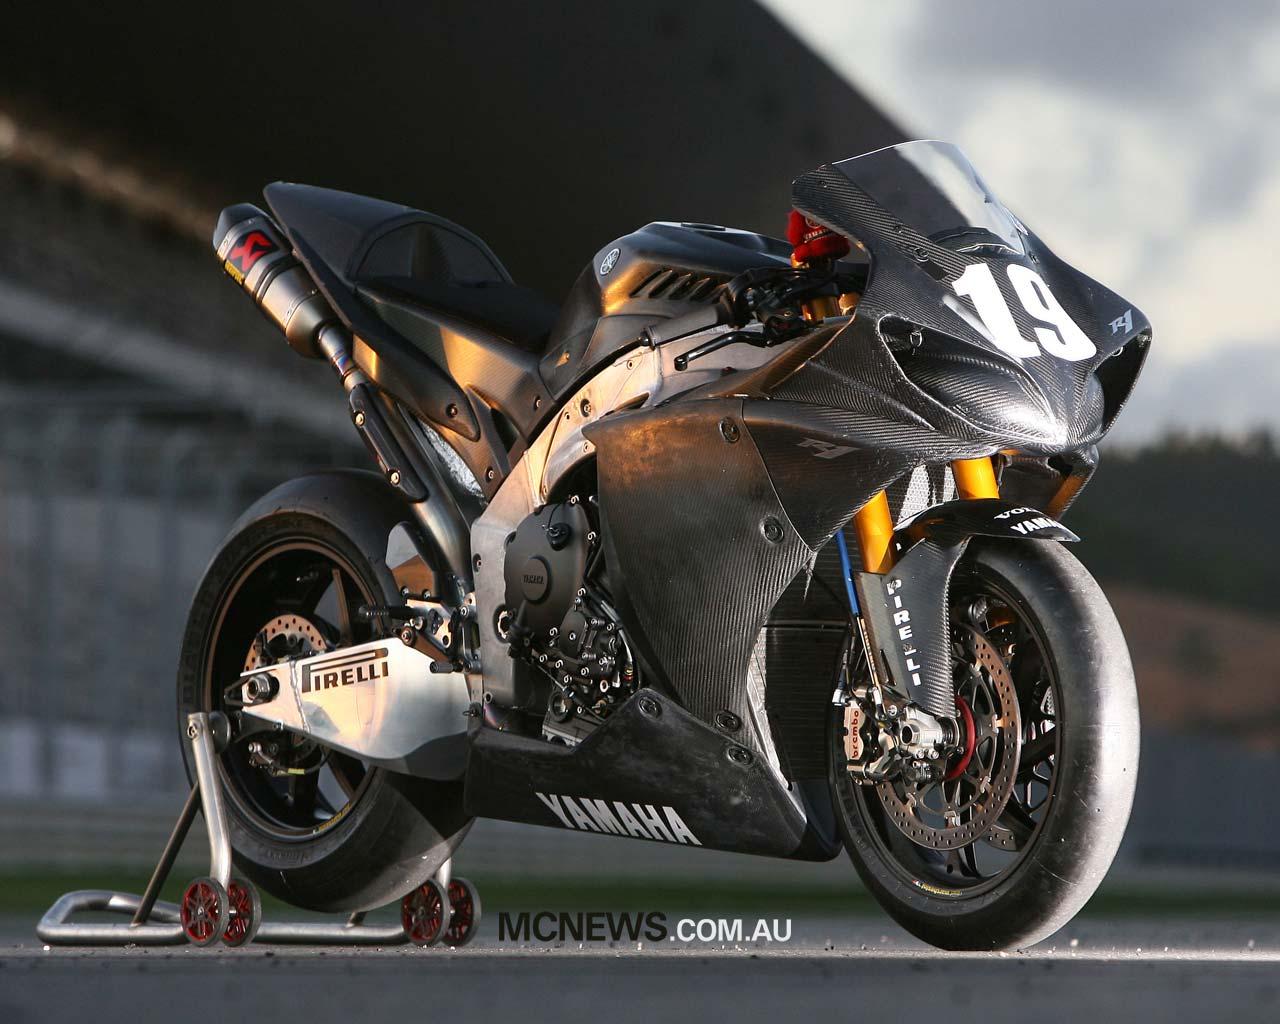 Vehicleeverything super bikes wall paper - Superbike wallpaper ...